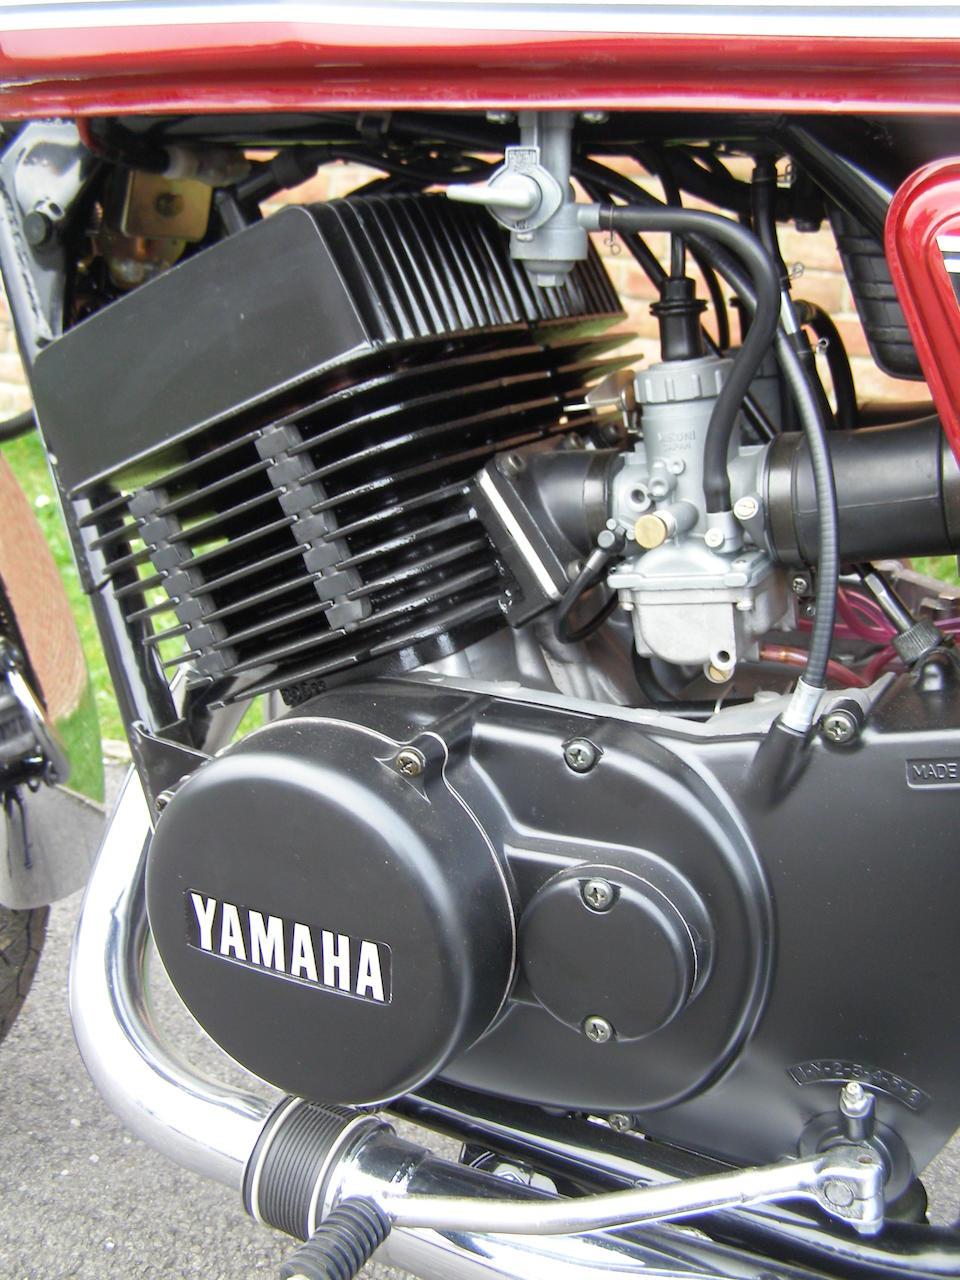 A pre-production model; 45 kilometres since restoration,1975 Yamaha RD400 Frame no. 1A3-000008 Engine no. 1A3-000008